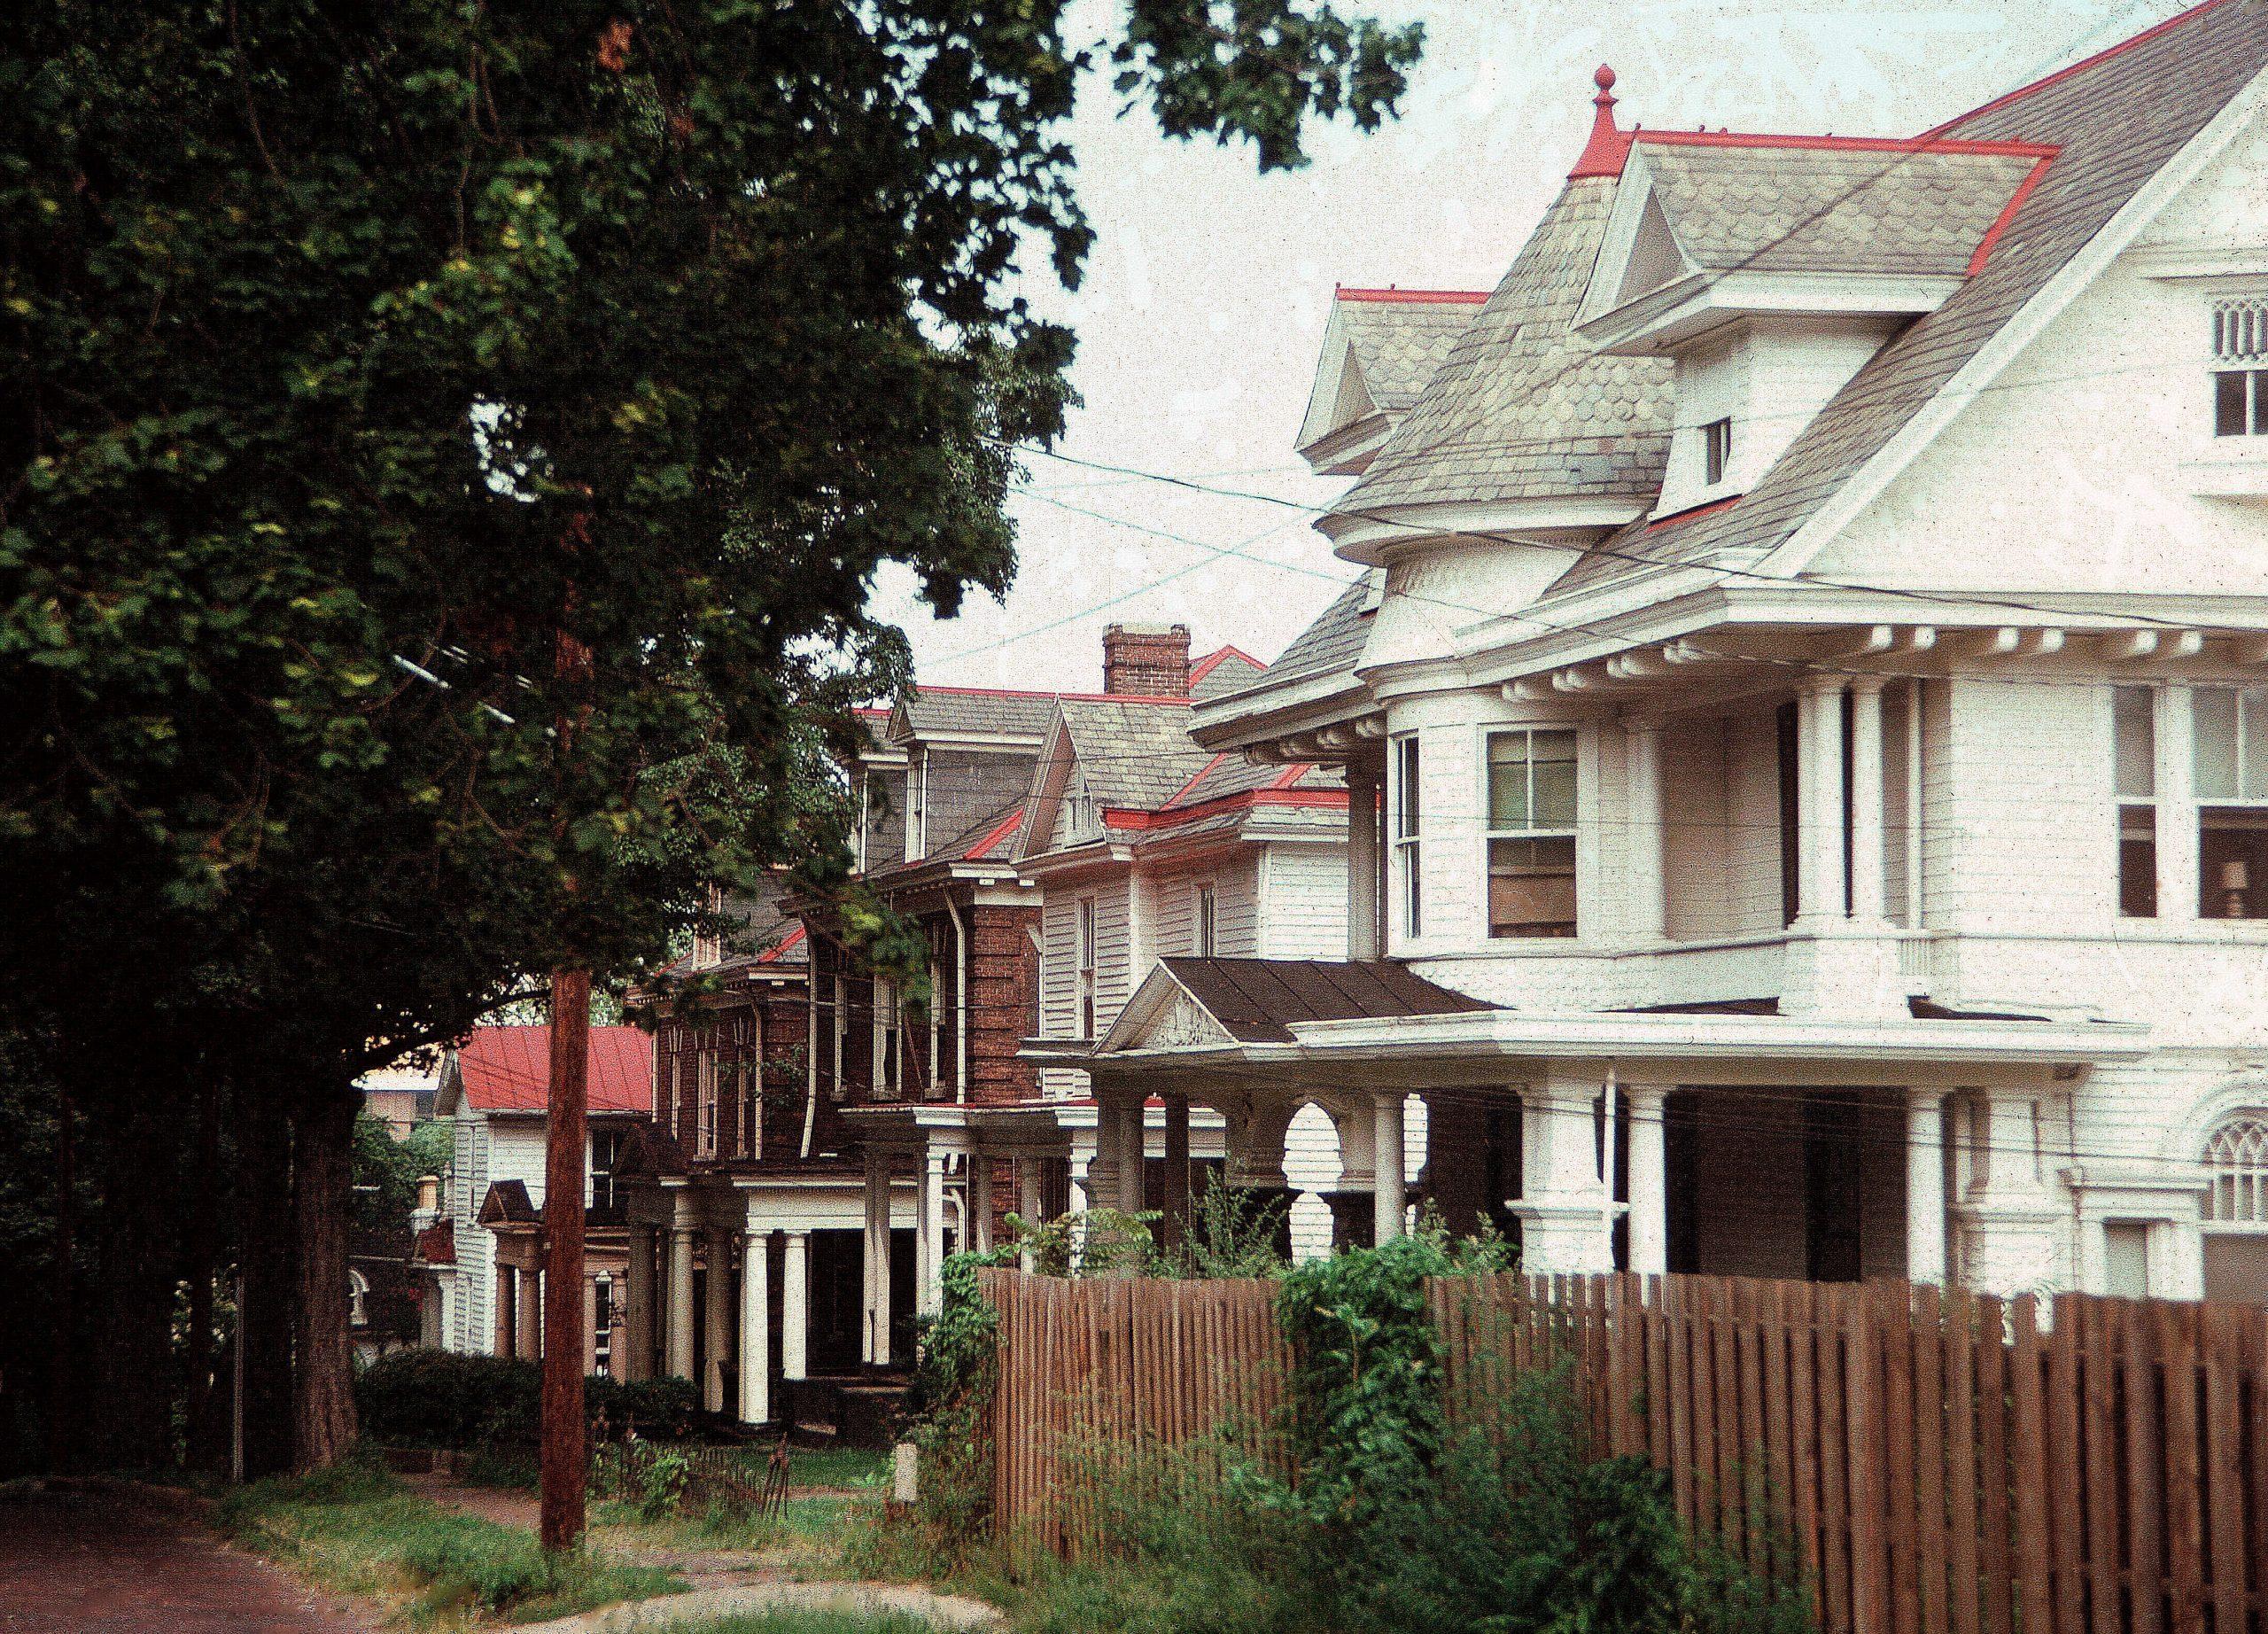 Diamond Hill Historic District